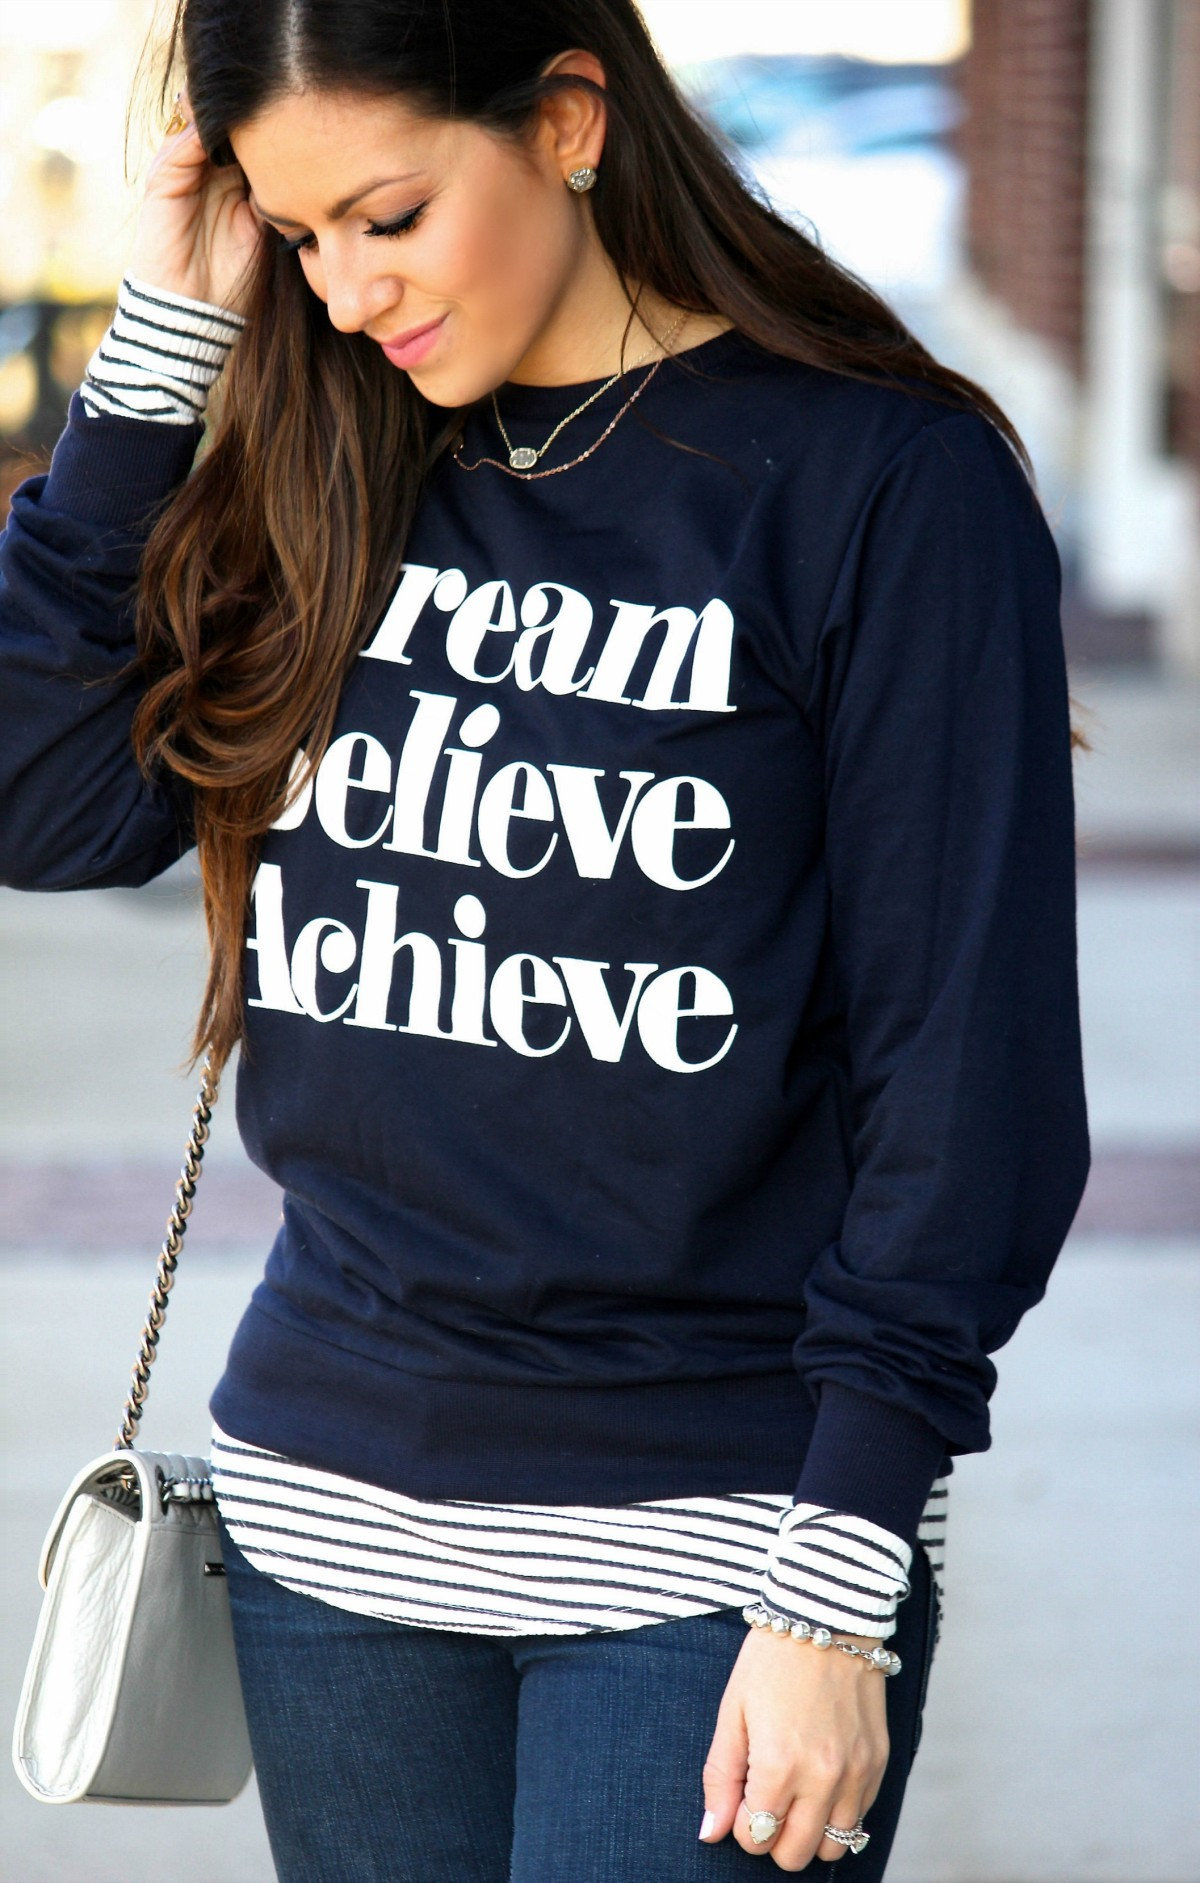 Dream Believe Achieve sweatshirt, how to dress up a sweatshirt